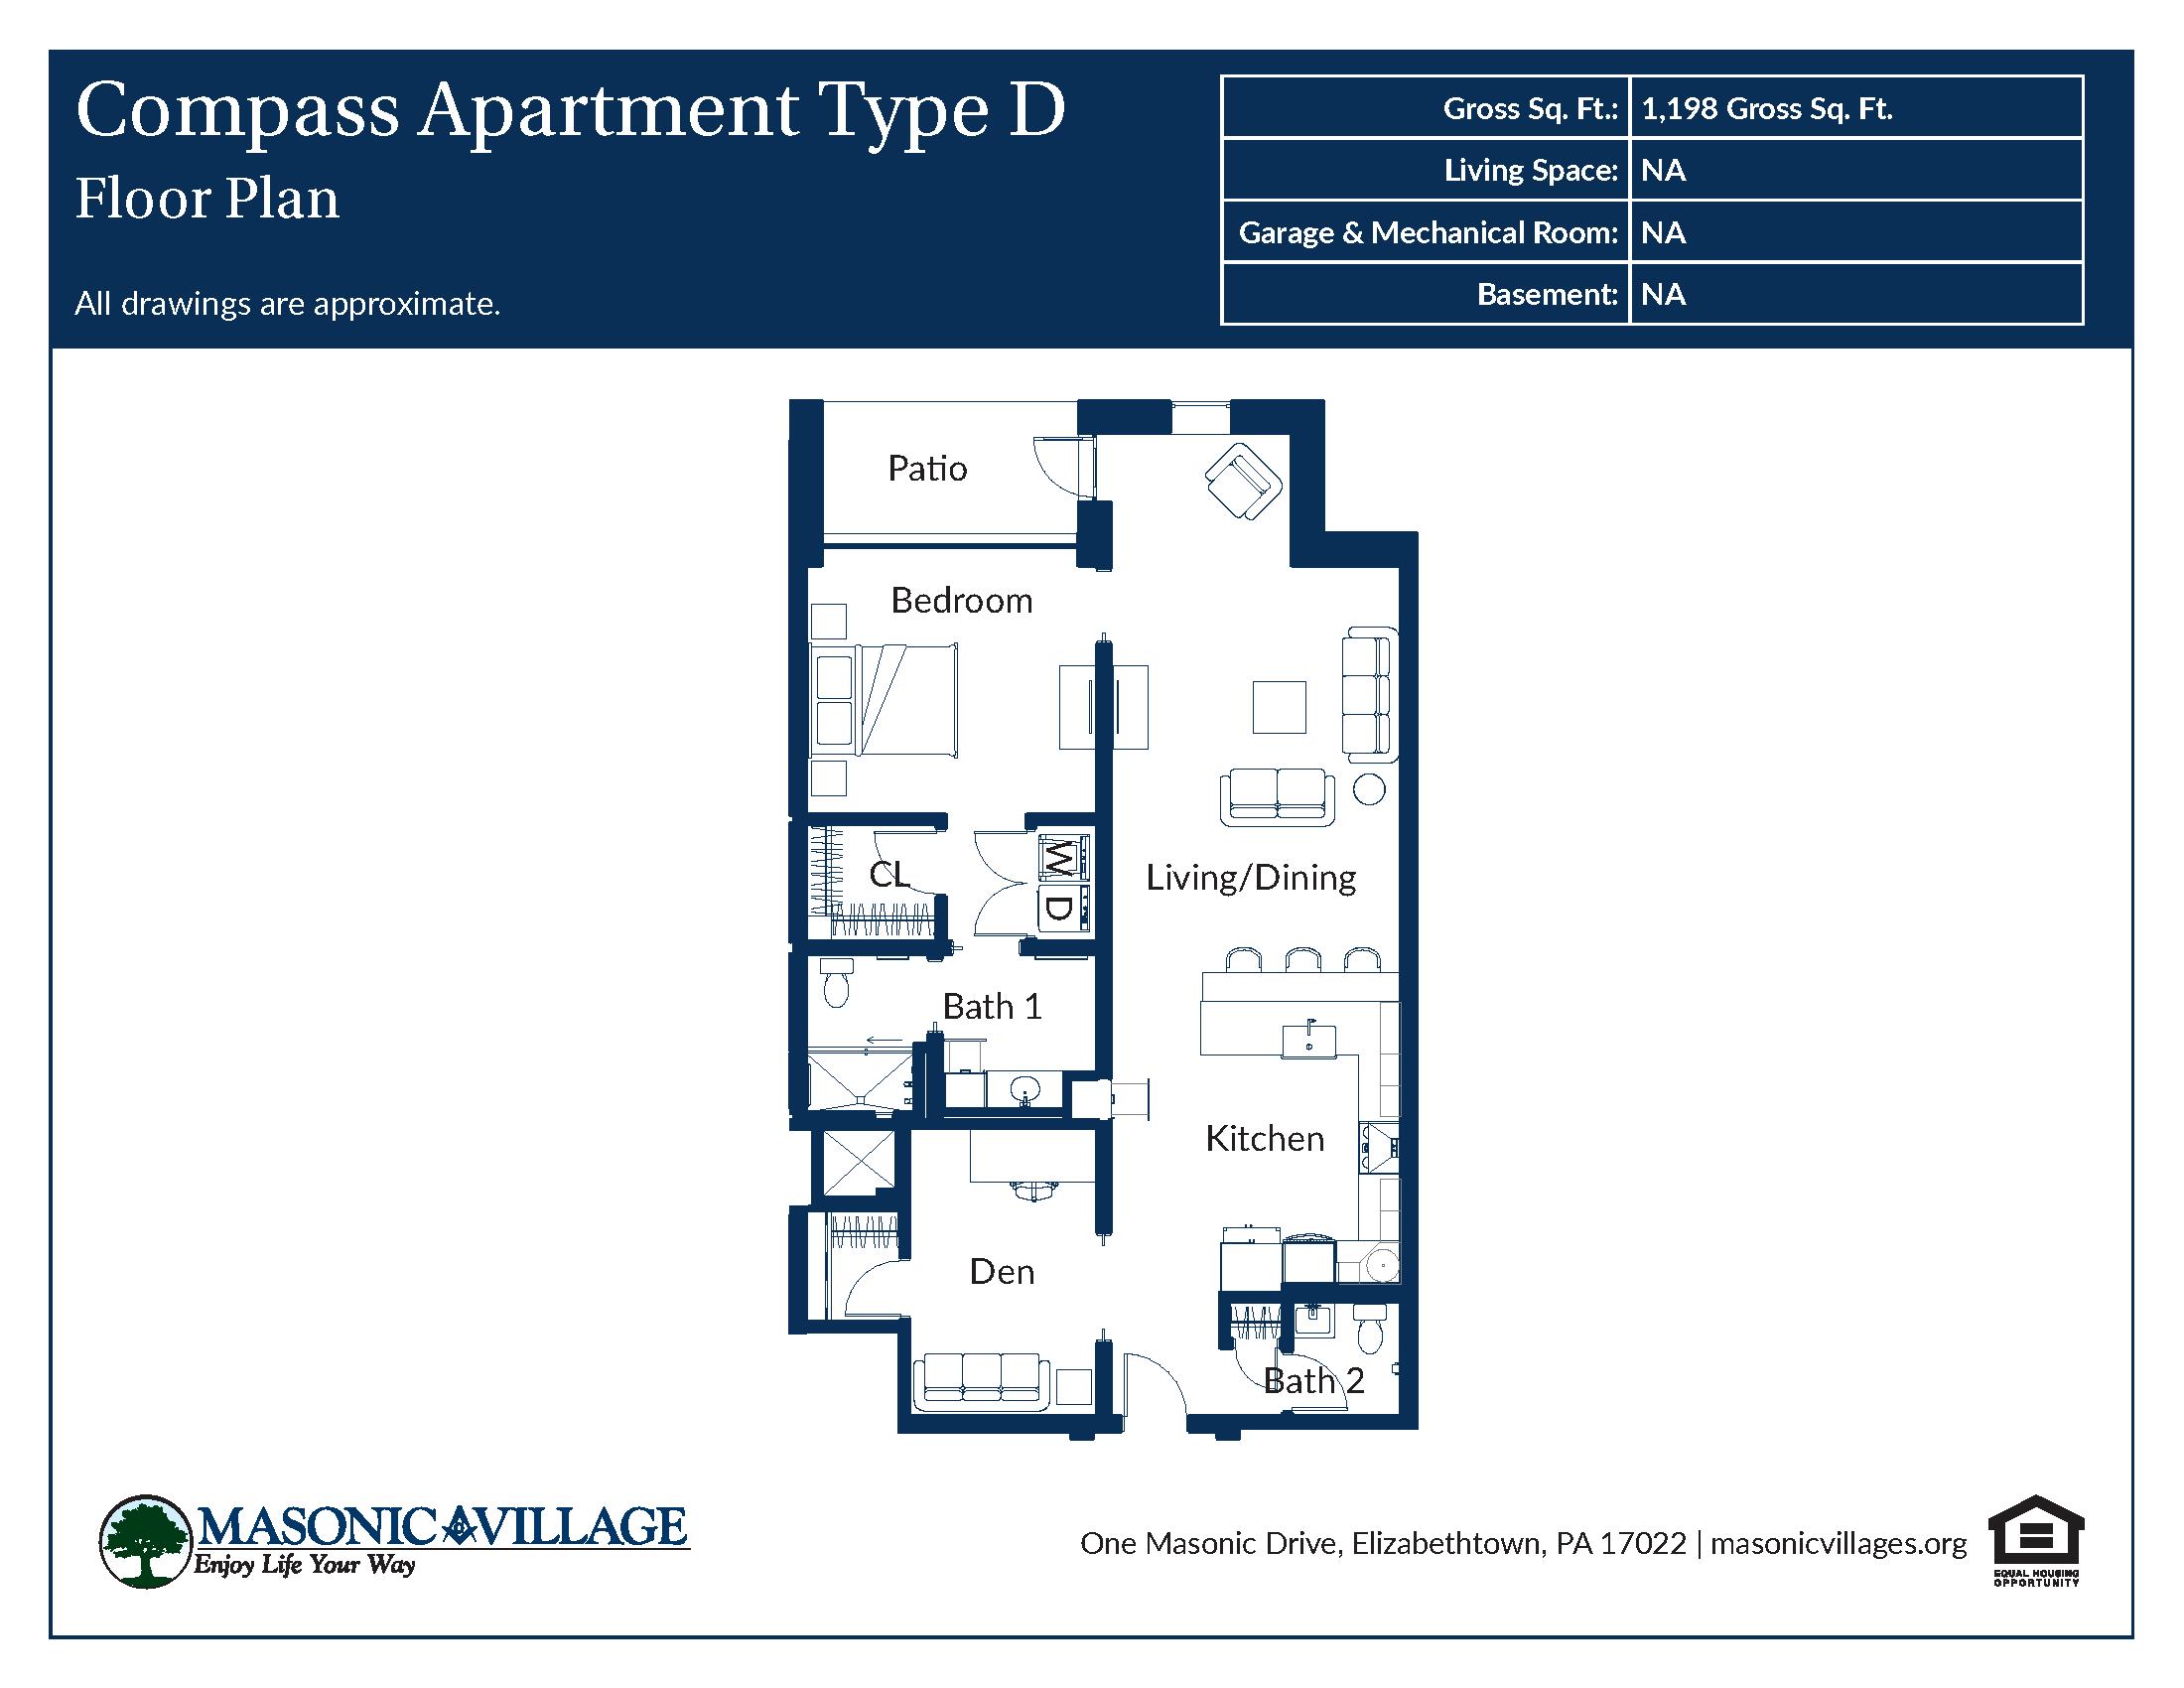 Masonic Village at Elizabethtown - Compass Apartment D Floor Plan